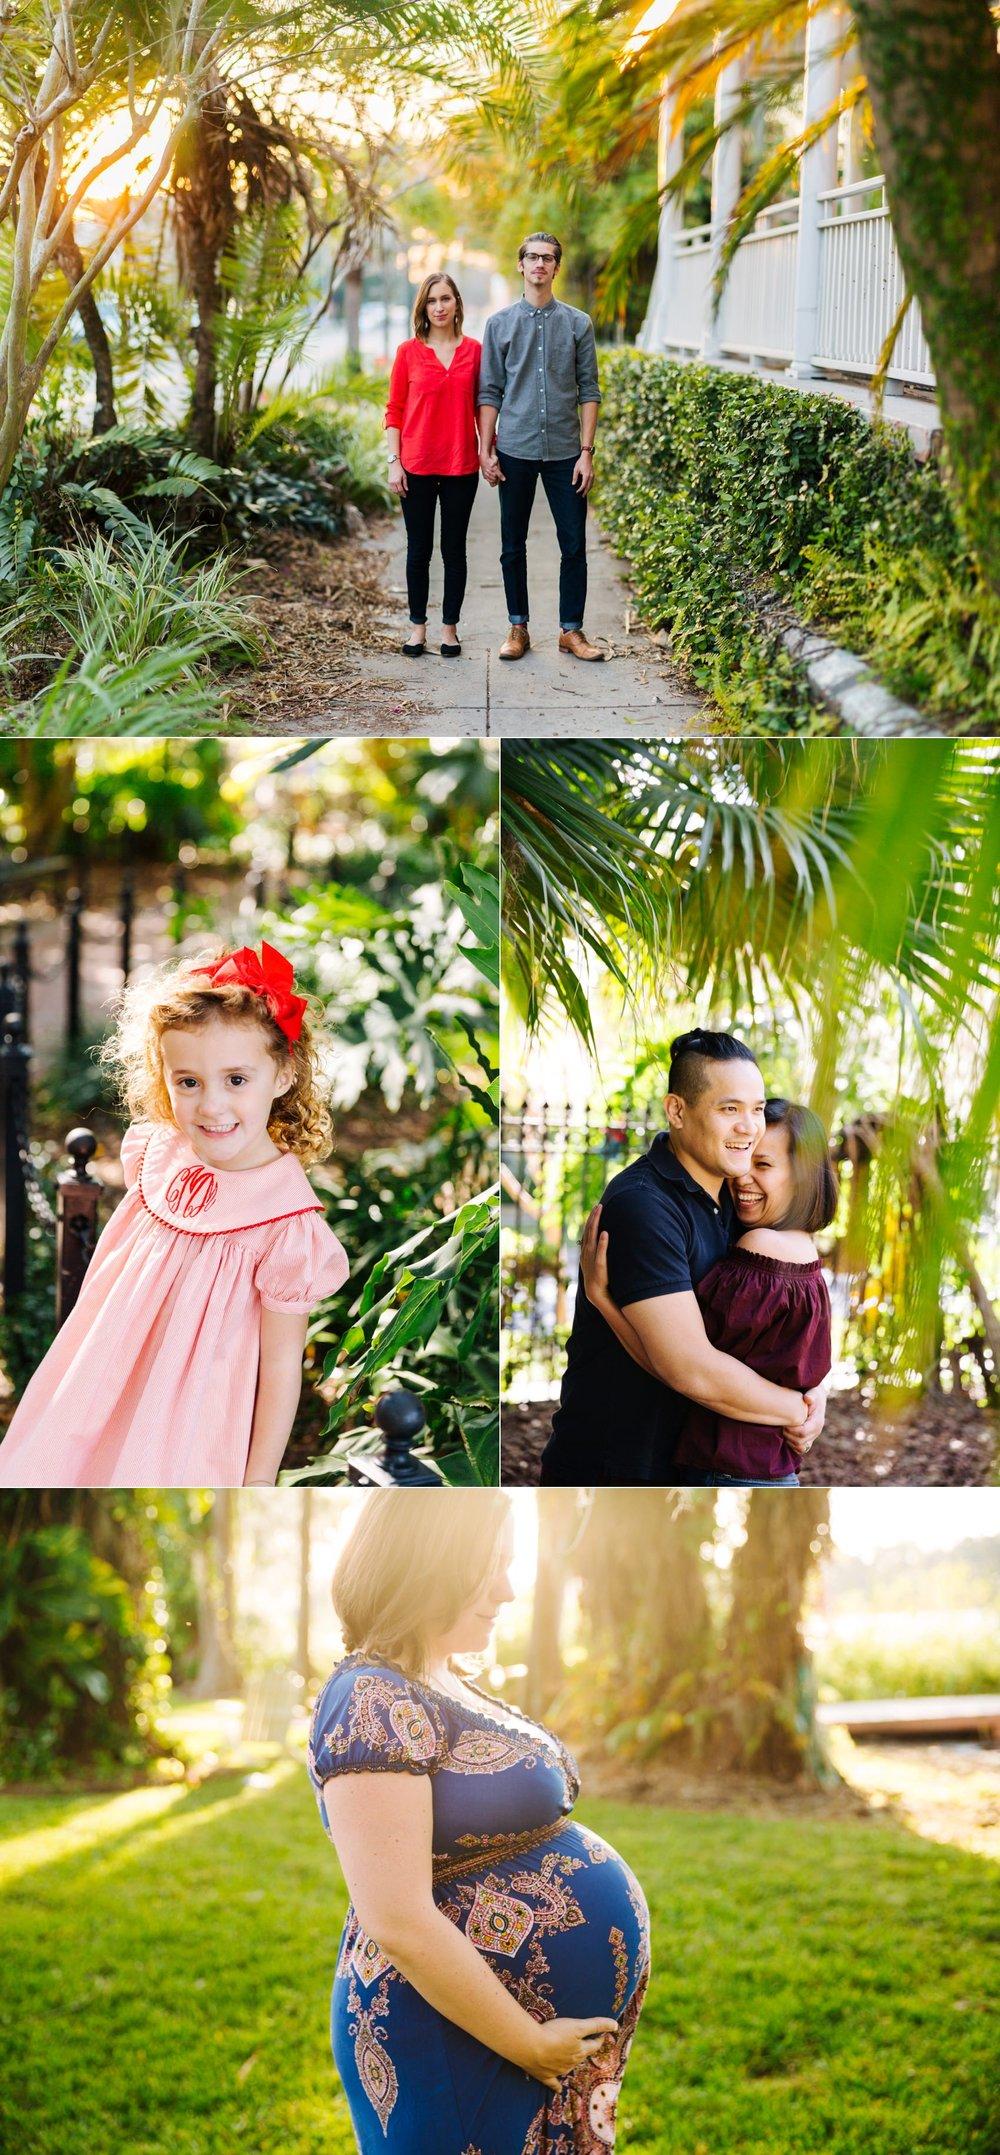 Jake & Katie's Best of Families 2016-007.jpg